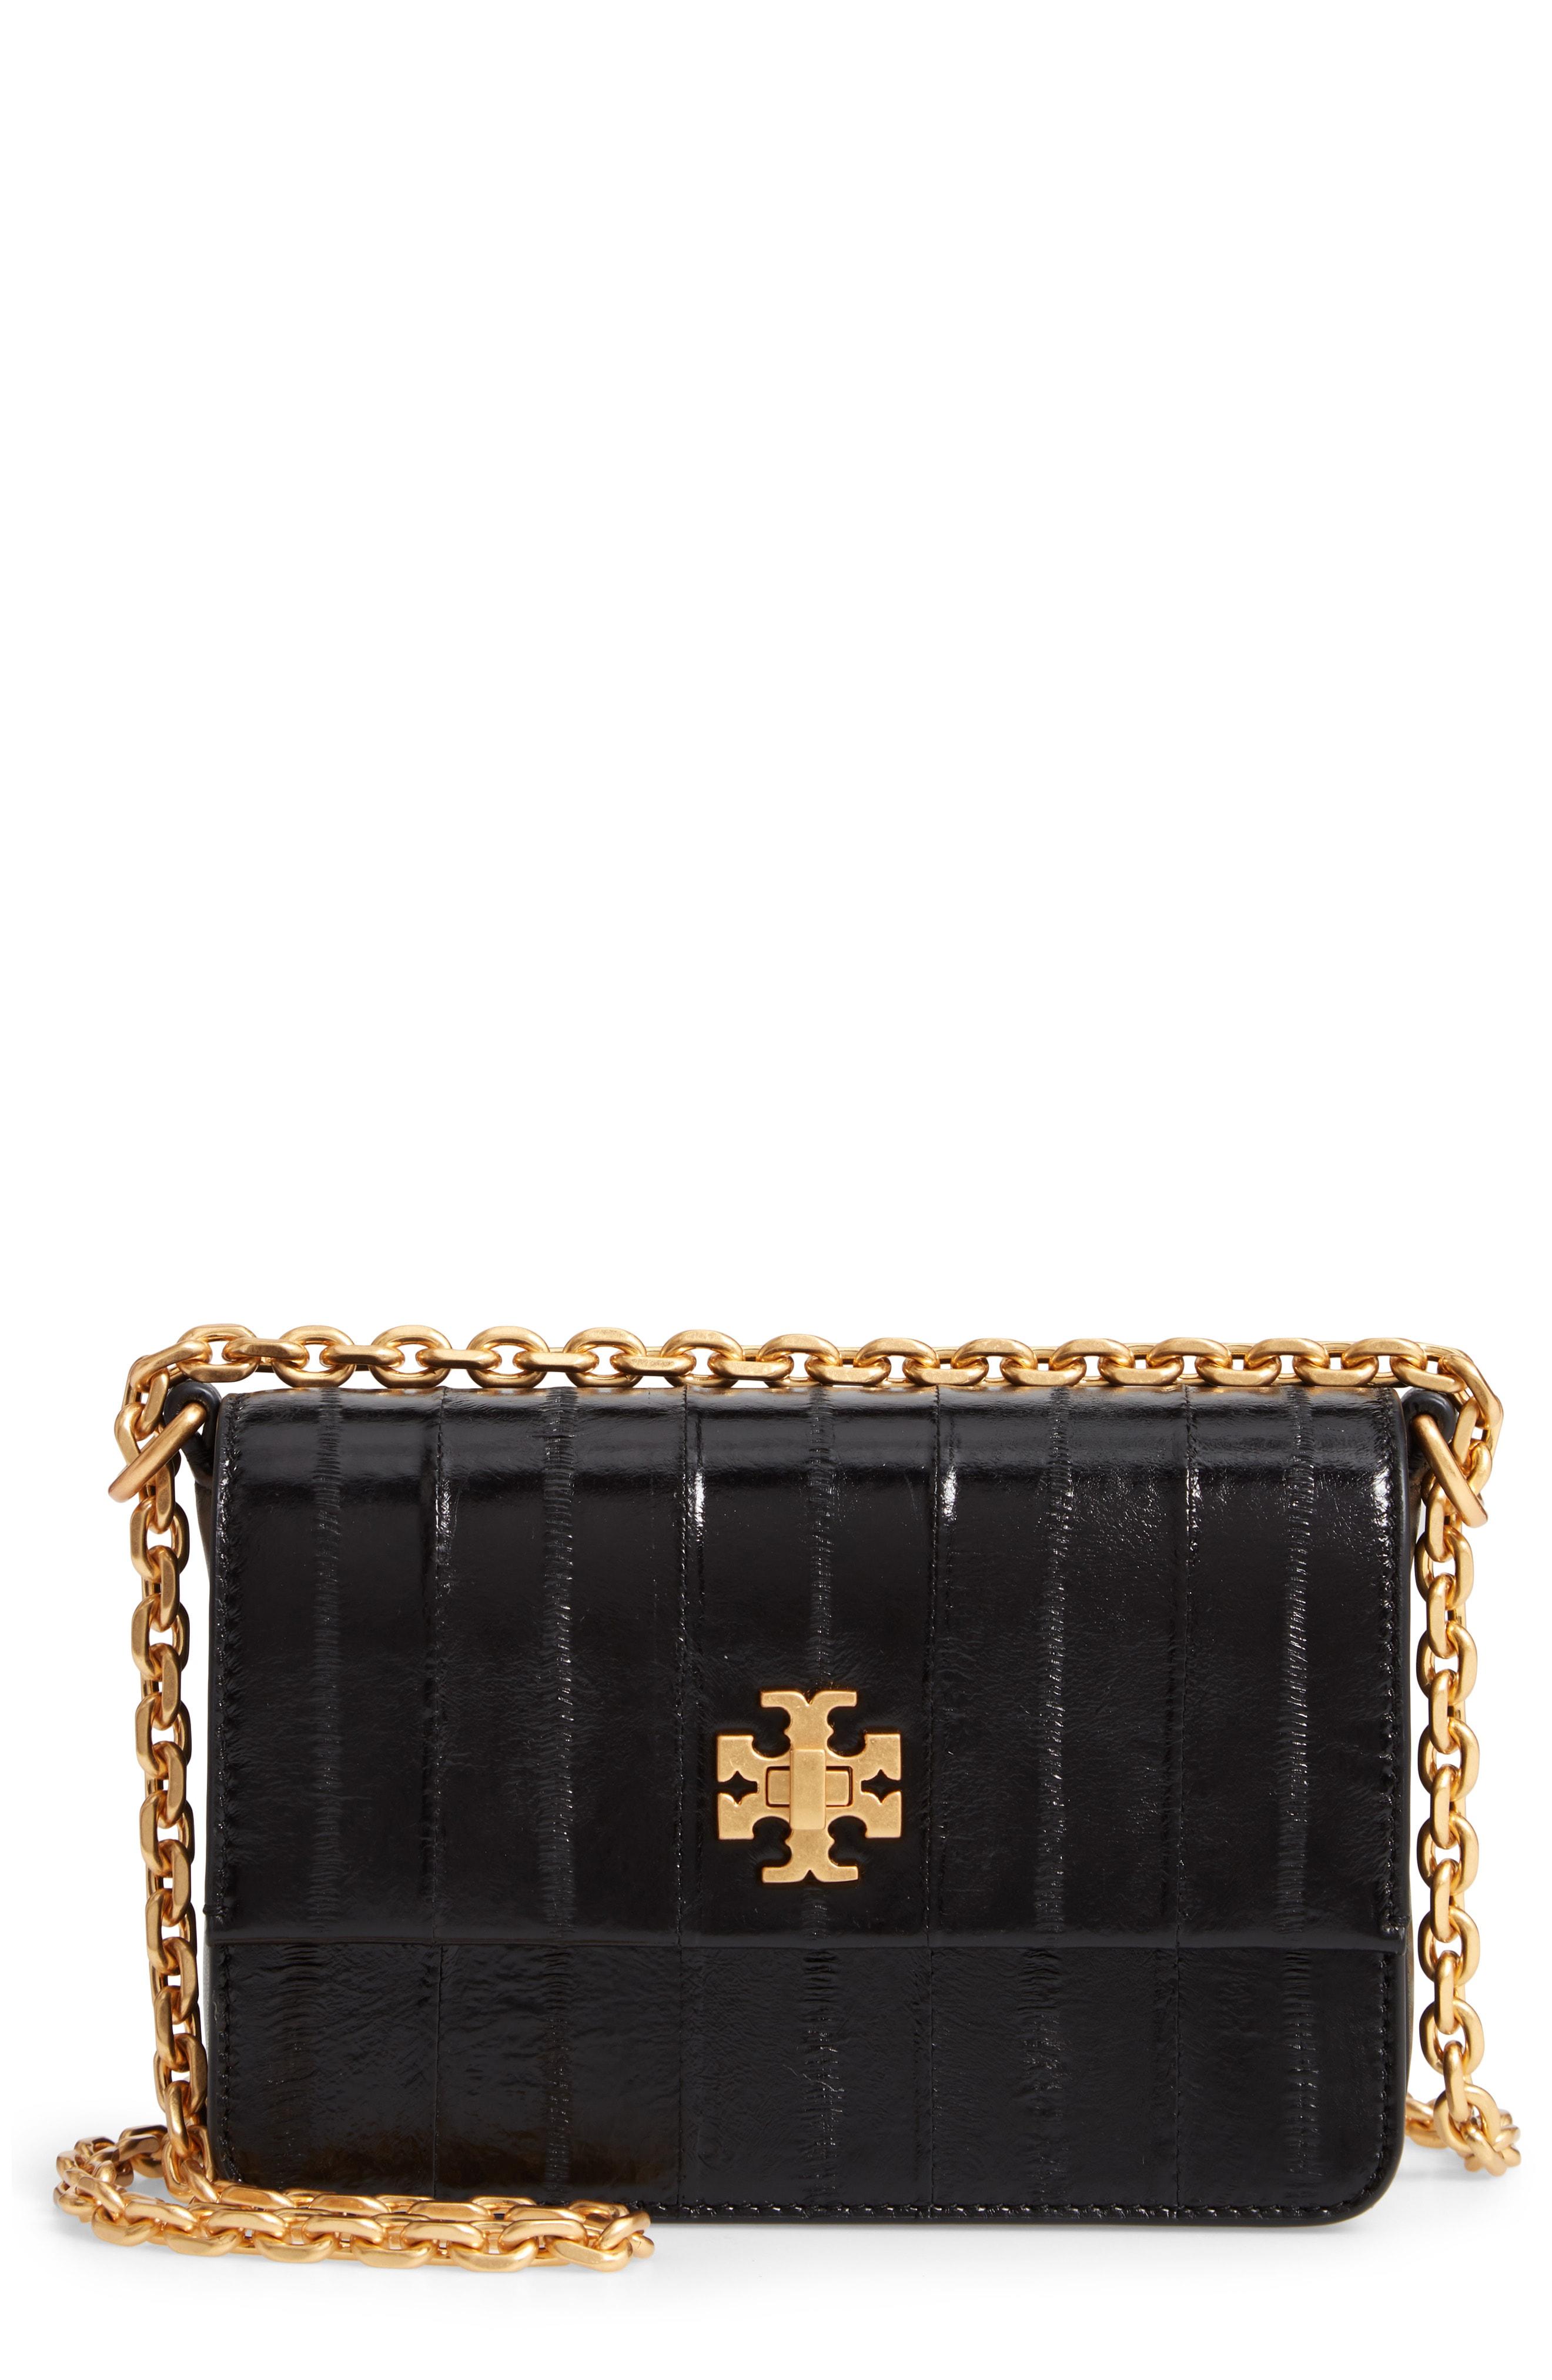 Tory Burch Mini Kira Eelskin Bag